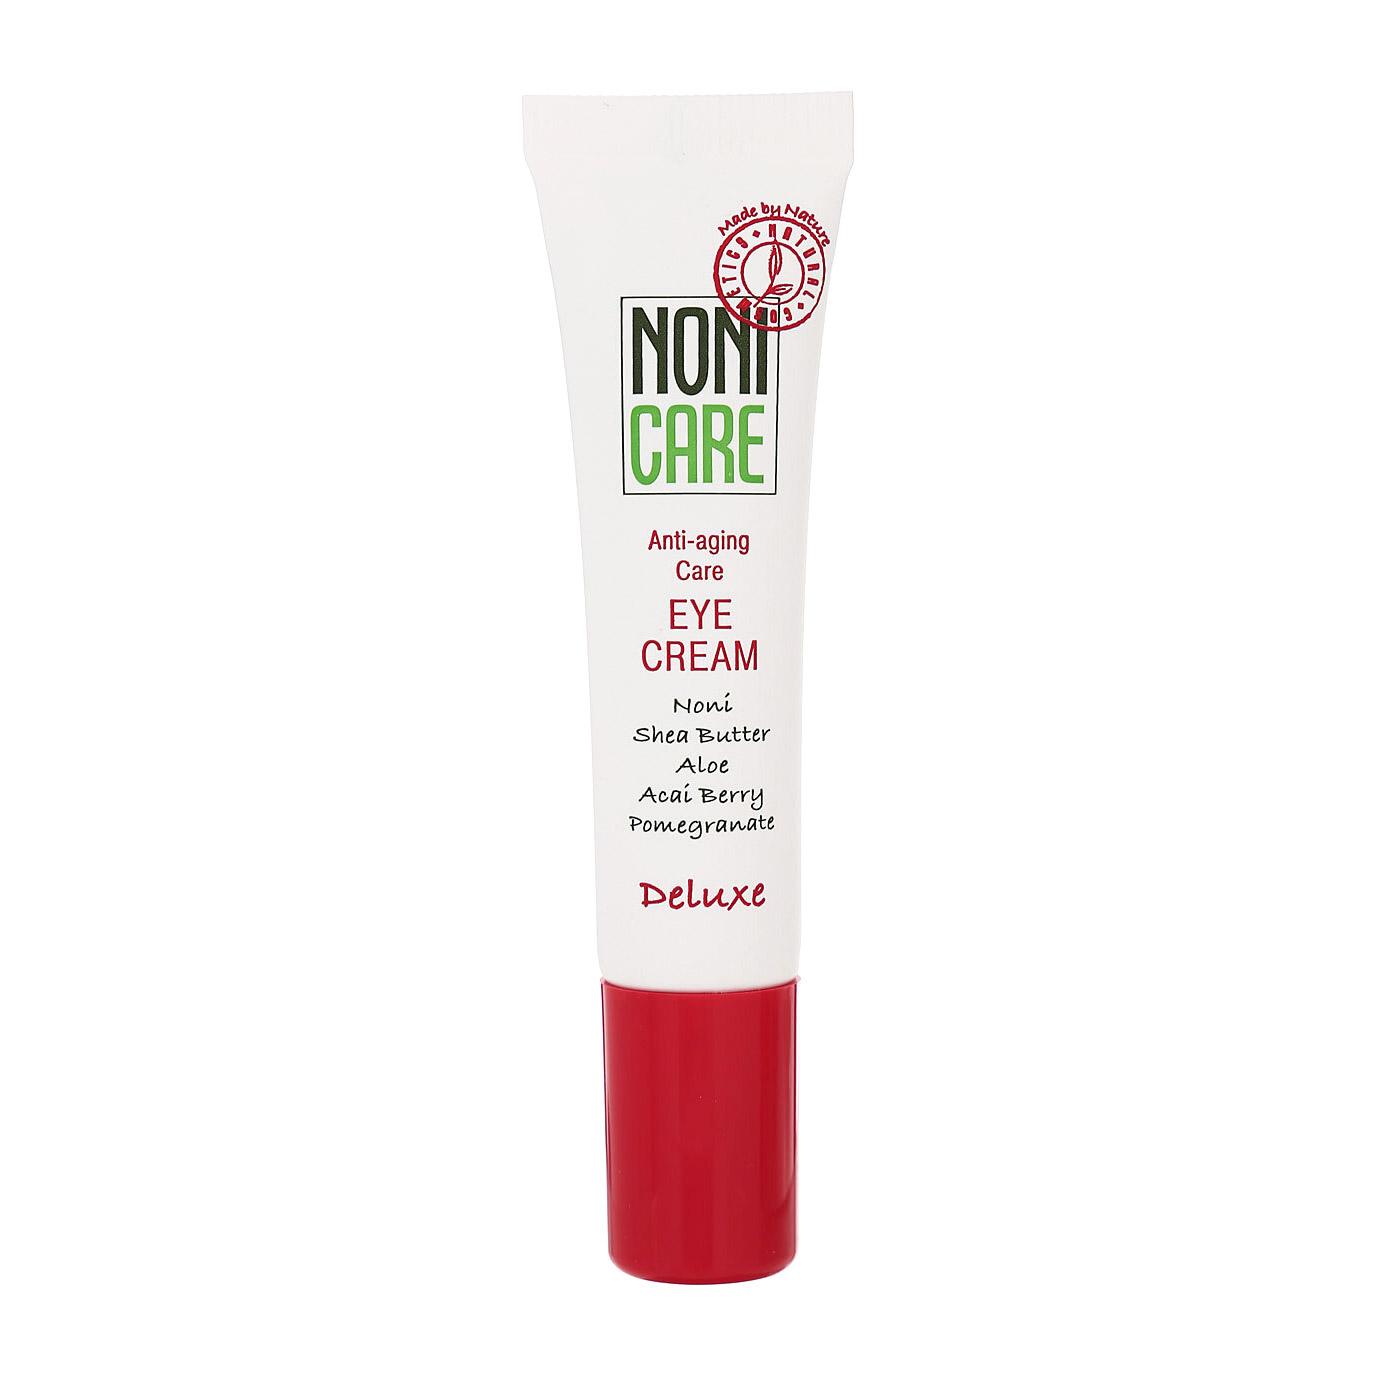 Омолаживающий крем для контура глаз Nonicare Deluxe - Eye Cream 15 мл 40+ ночной крем от морщин nonicare deluxe night face cream 50 мл 40